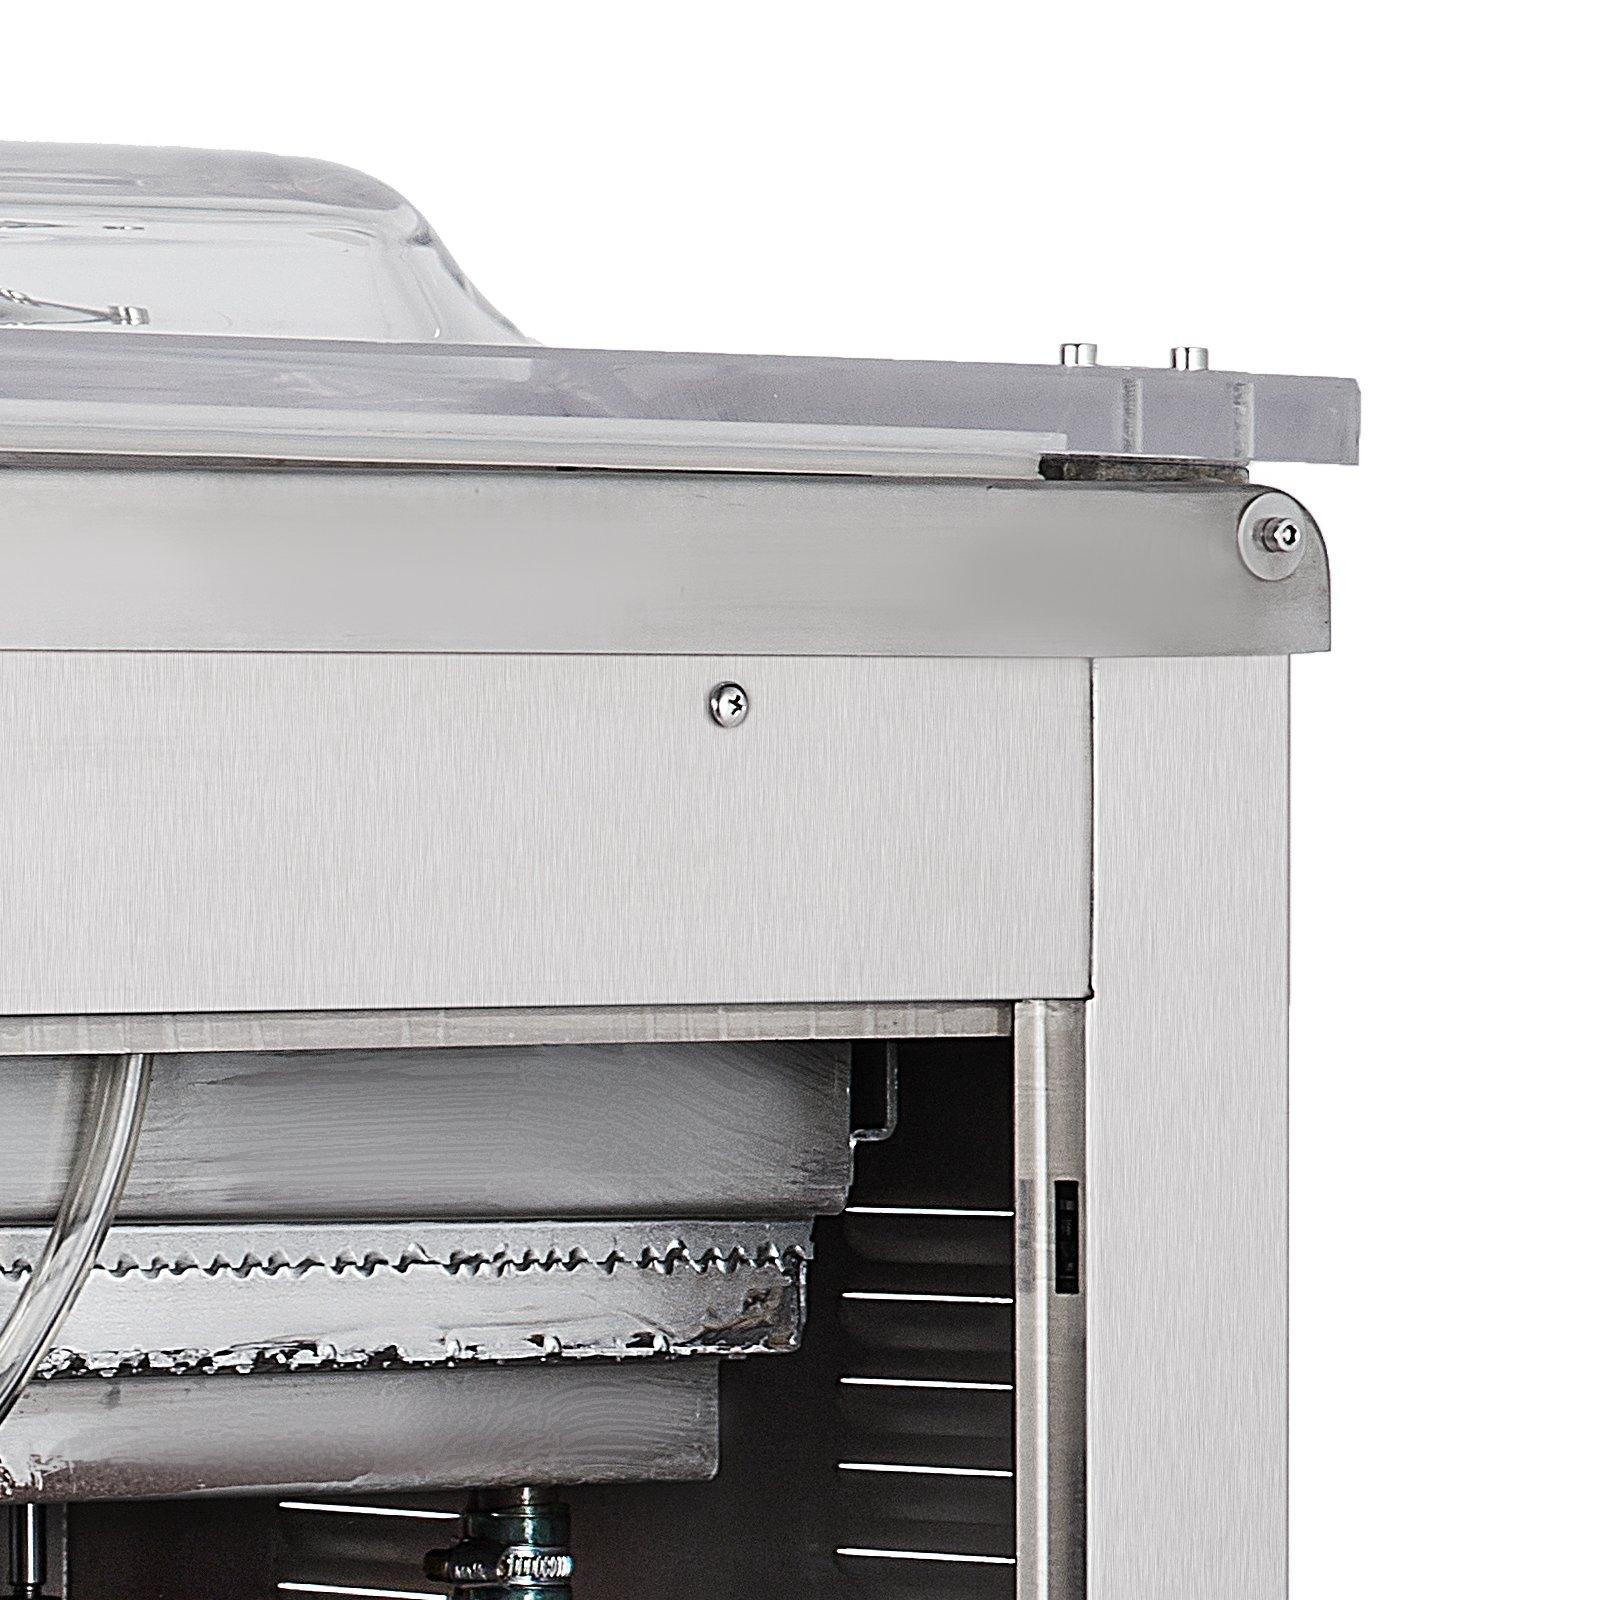 Happybuy DZ-400/2E Chamber Vacuum Sealer 1000W Vacuum Sealer Machine Automatic Vacuum Packing Sealing Sealer Machine for Home or Commercial Use (DZ-400/2E) by Happybuy (Image #8)